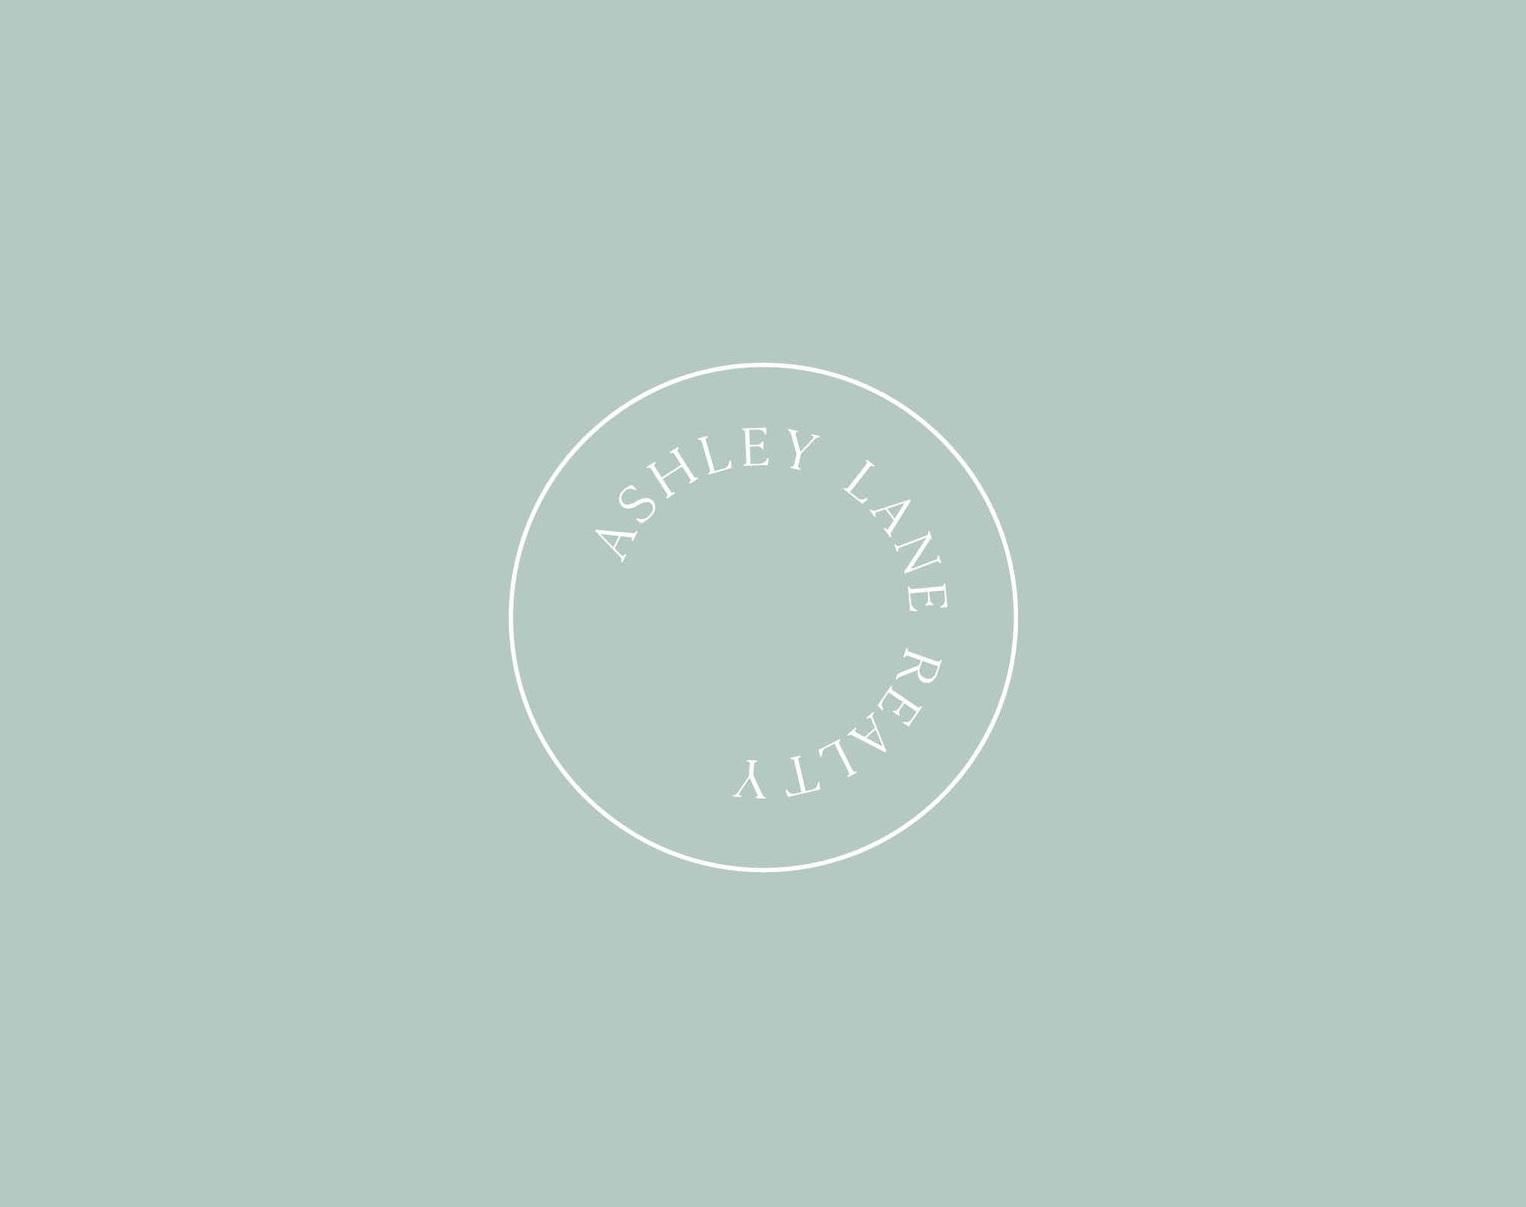 Ashley+Lane+Realty3.jpg